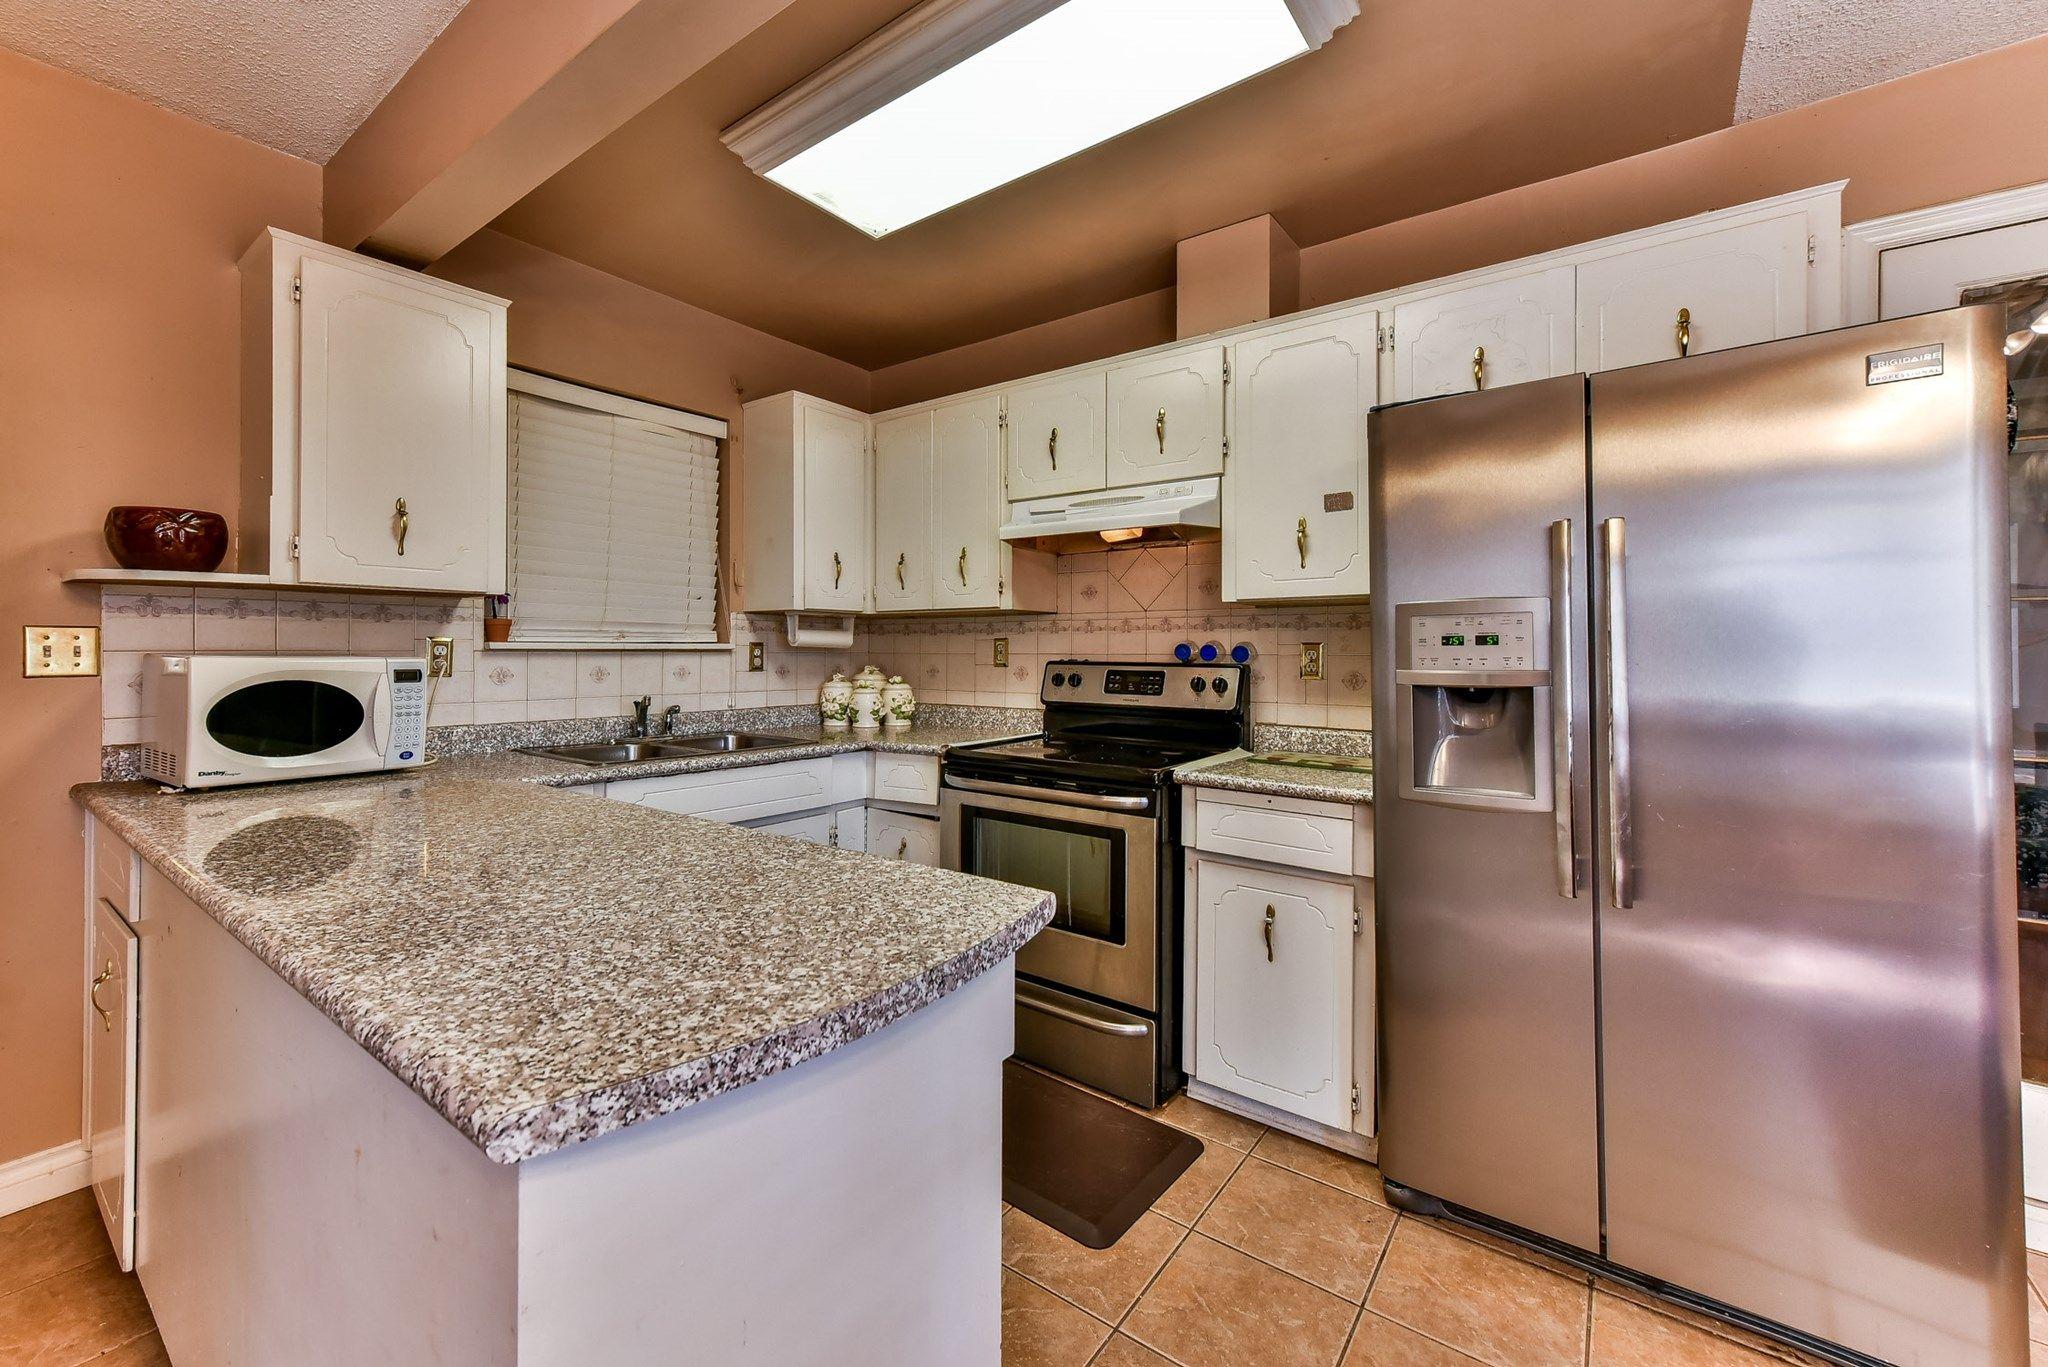 6733 133B ST, Surrey, BC - ID F1446268   Kitchen cabinets ...